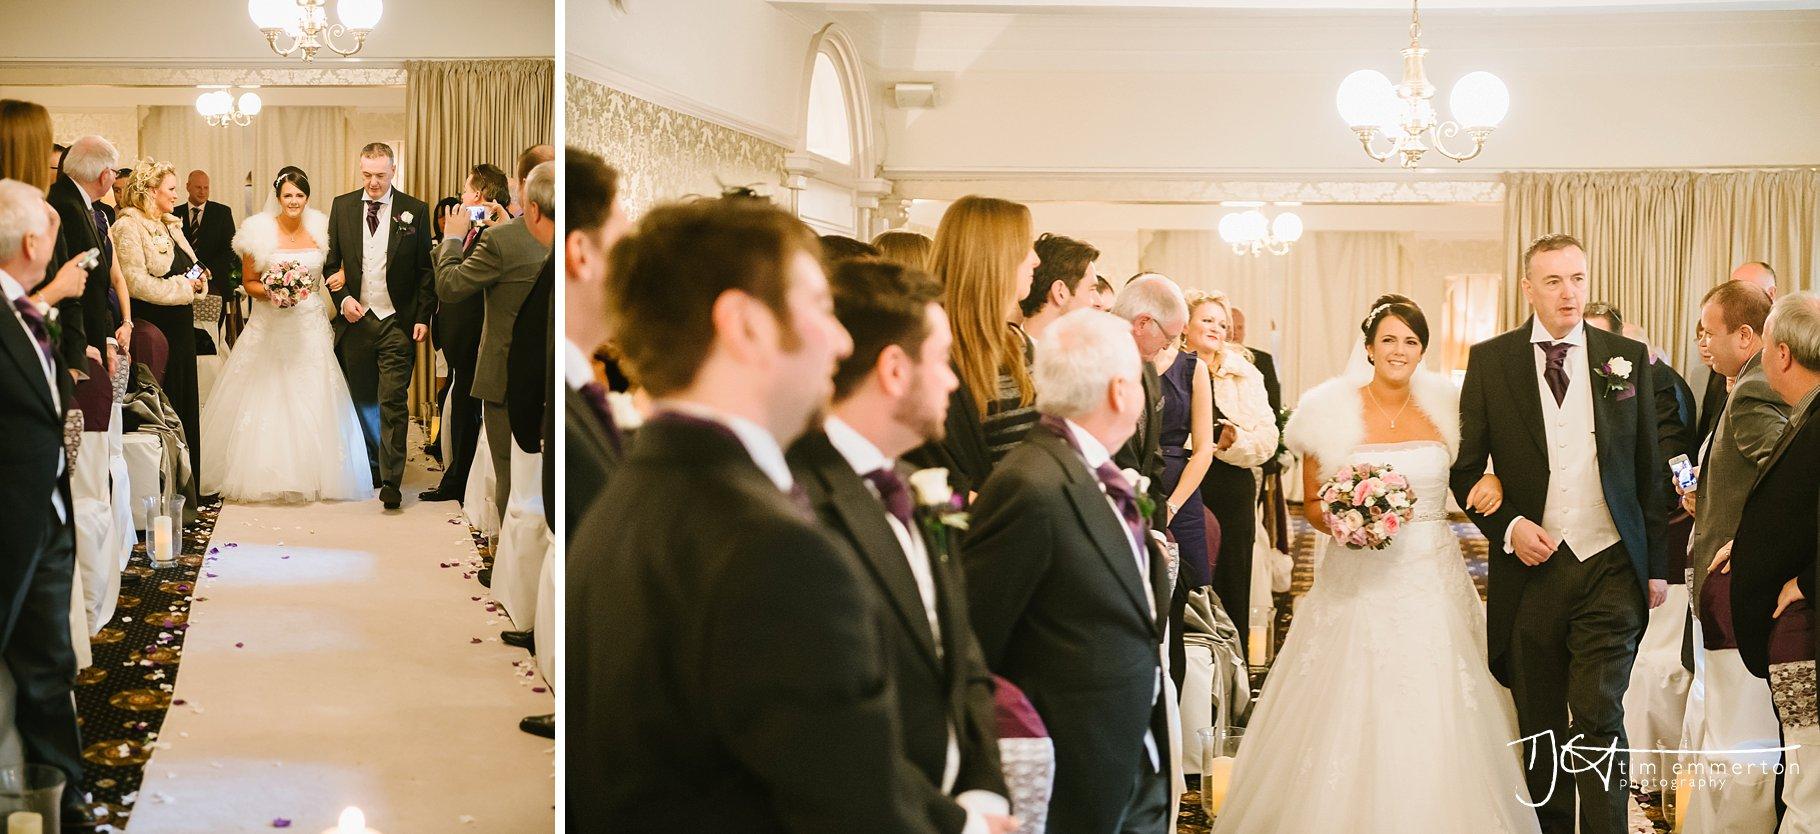 Jemma & Richard Bartle Hall Wedding Winter-014